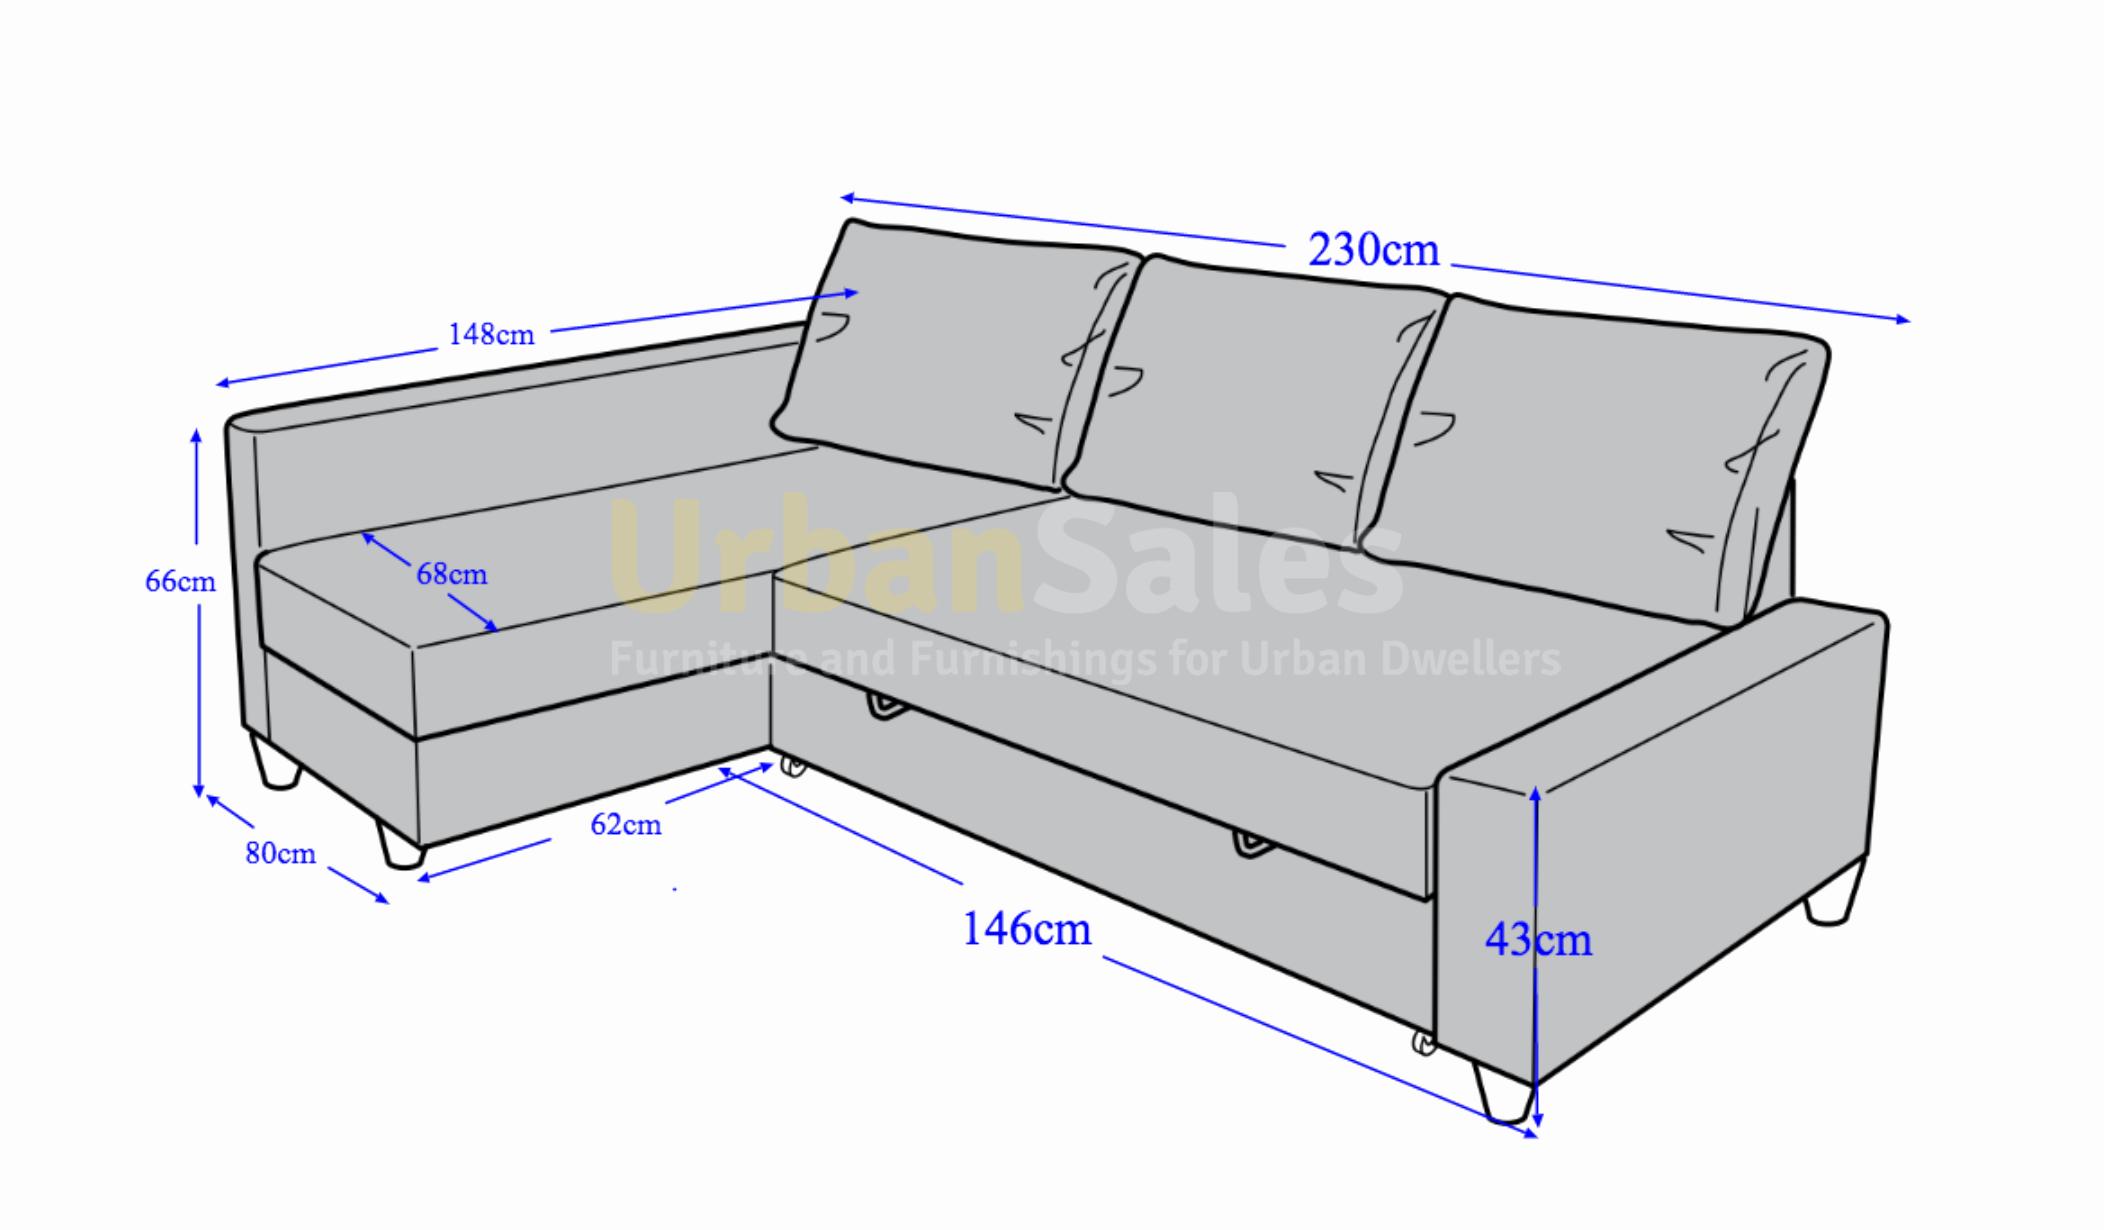 kivik sofa bed measurements www energywarden net IKEA Kivik Sofa KIVIK Sofa Bed Manual